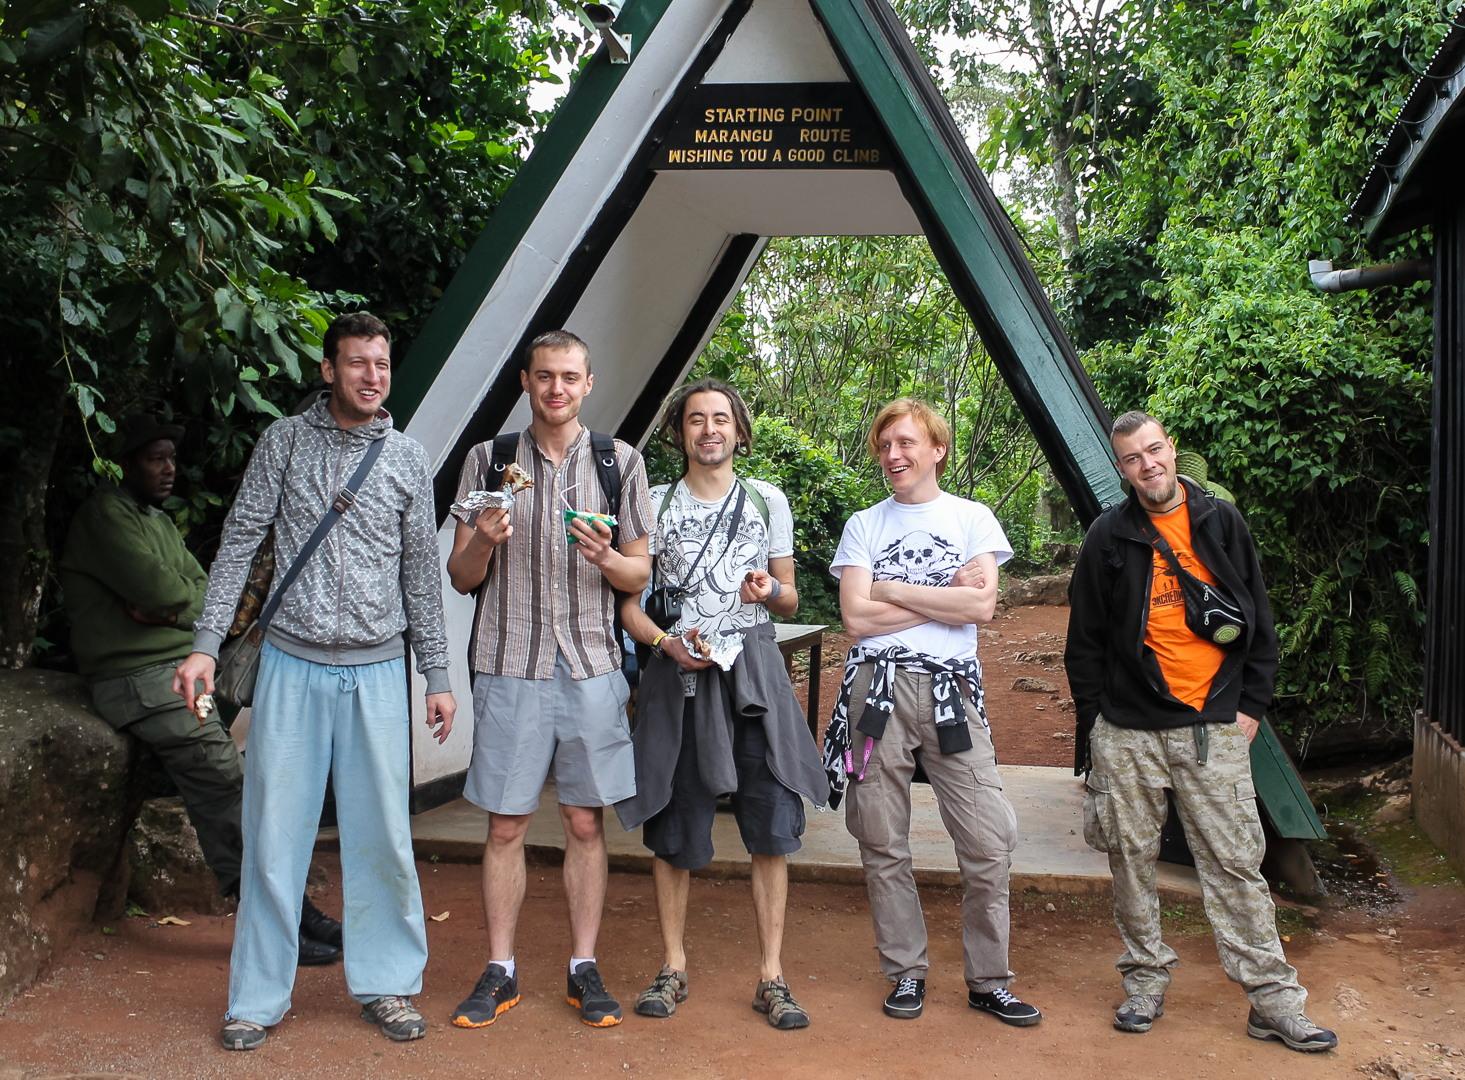 Ворота Марангу, Килиманжаро